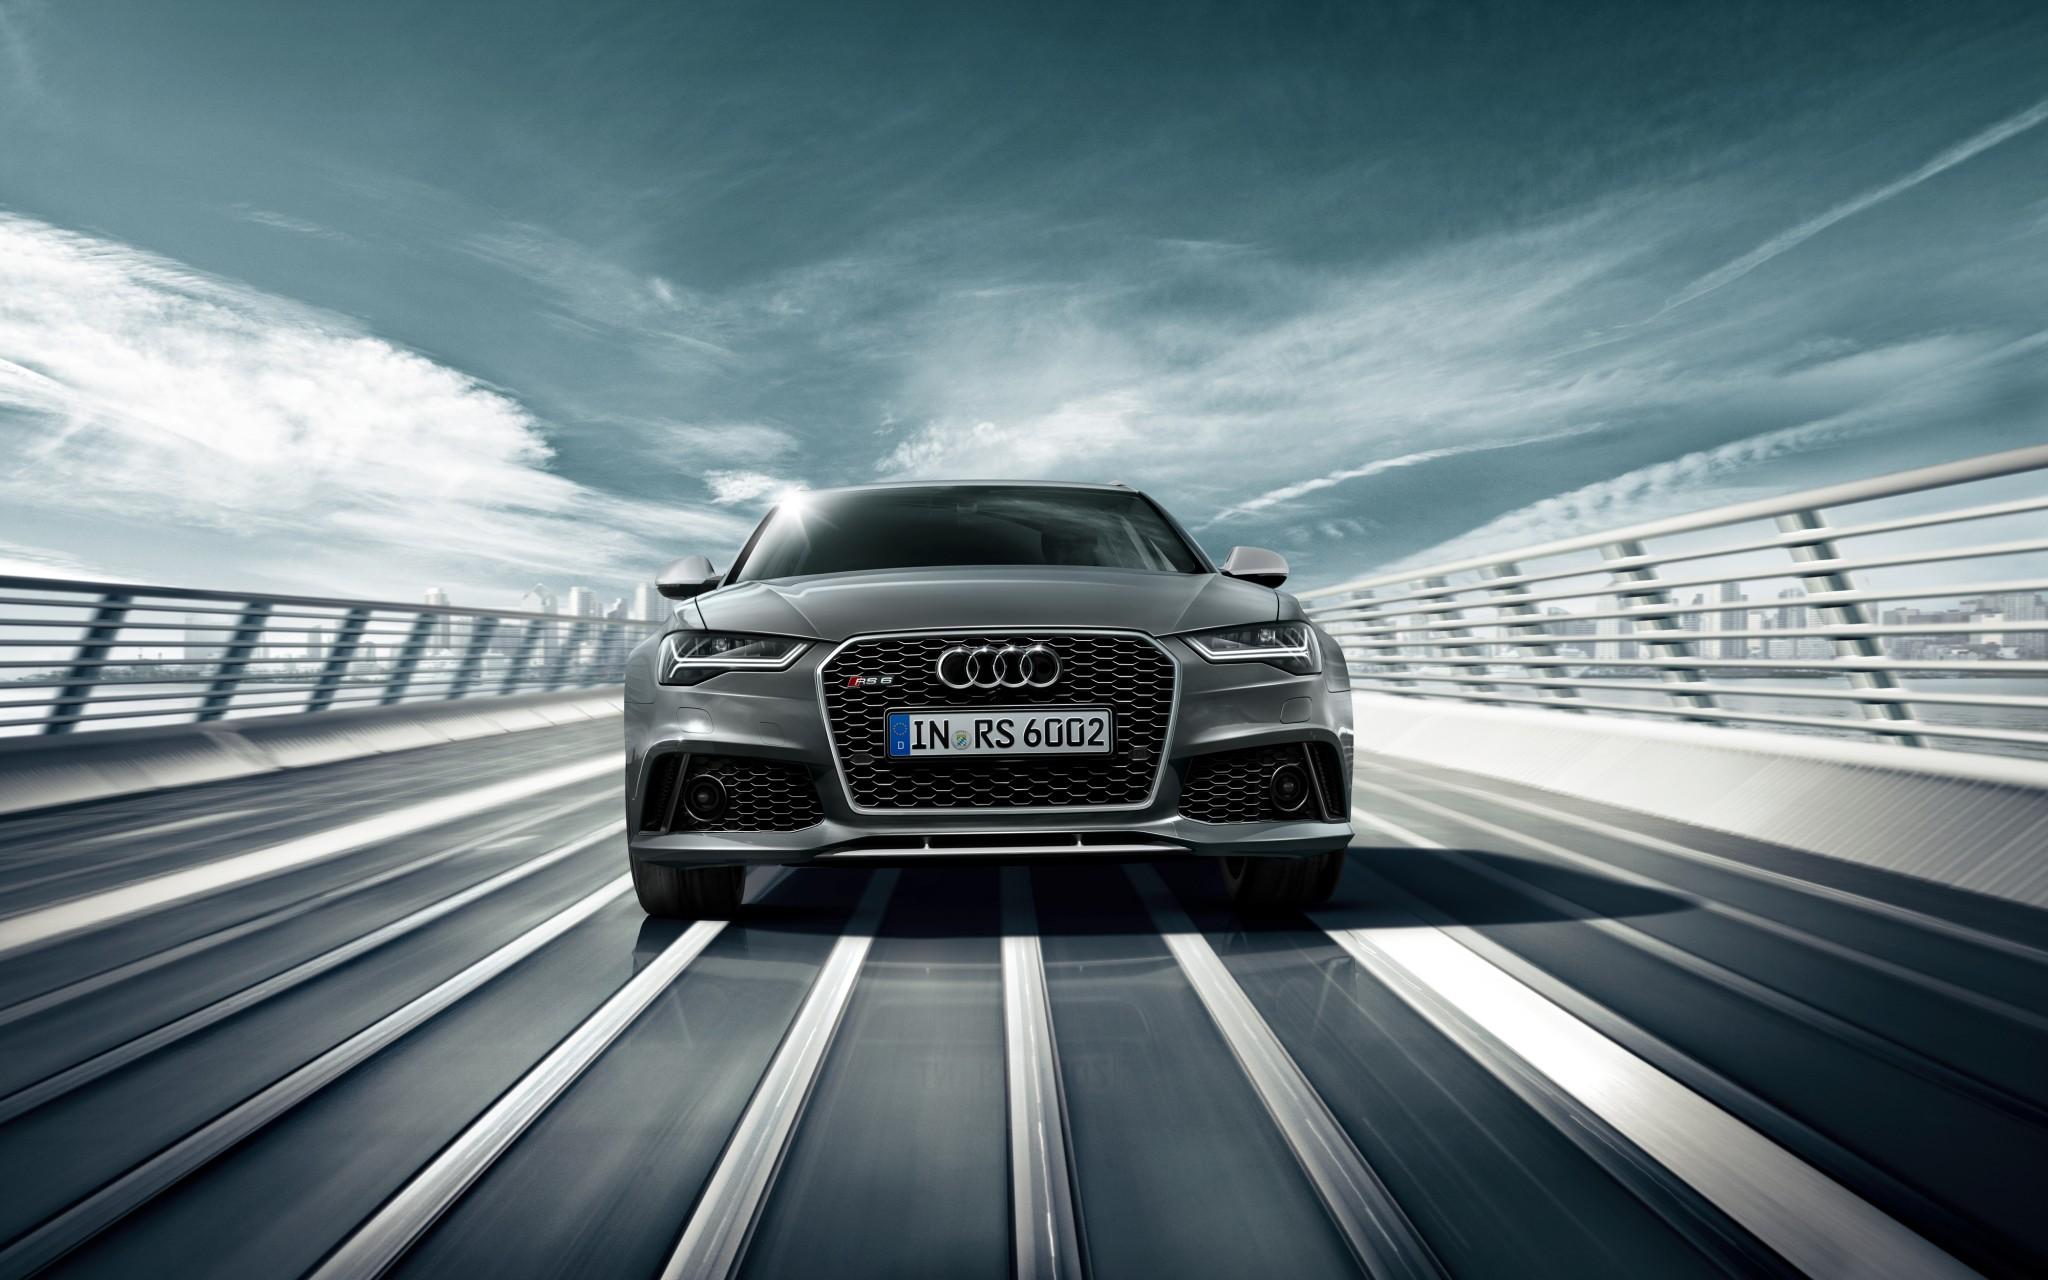 Client: Audi | Photographer: Holger Wild